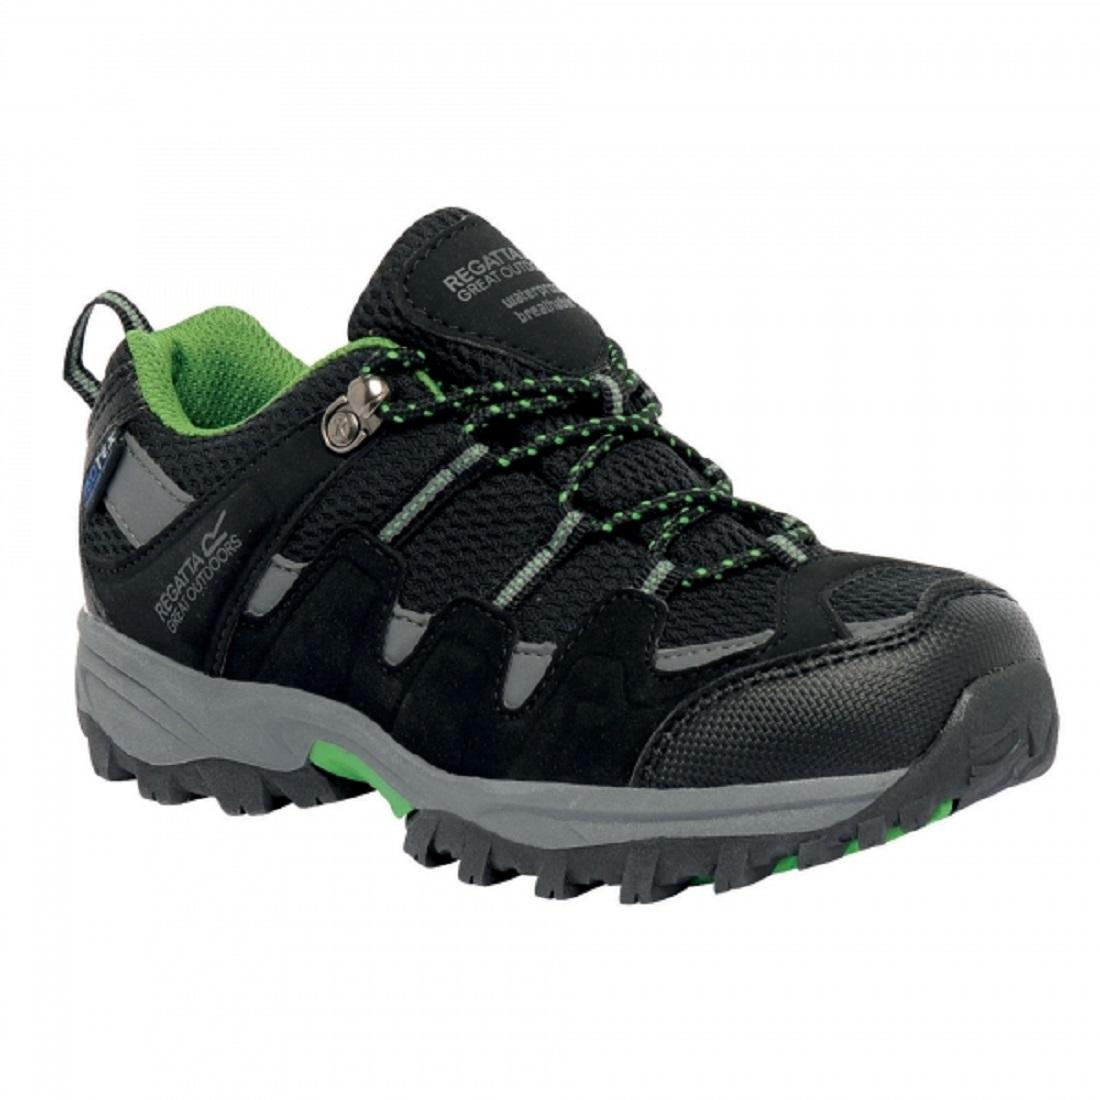 Regatta-Garsdale-Baja-Ninos-Resistente-al-Agua-Transpirable-Caminar-Zapato